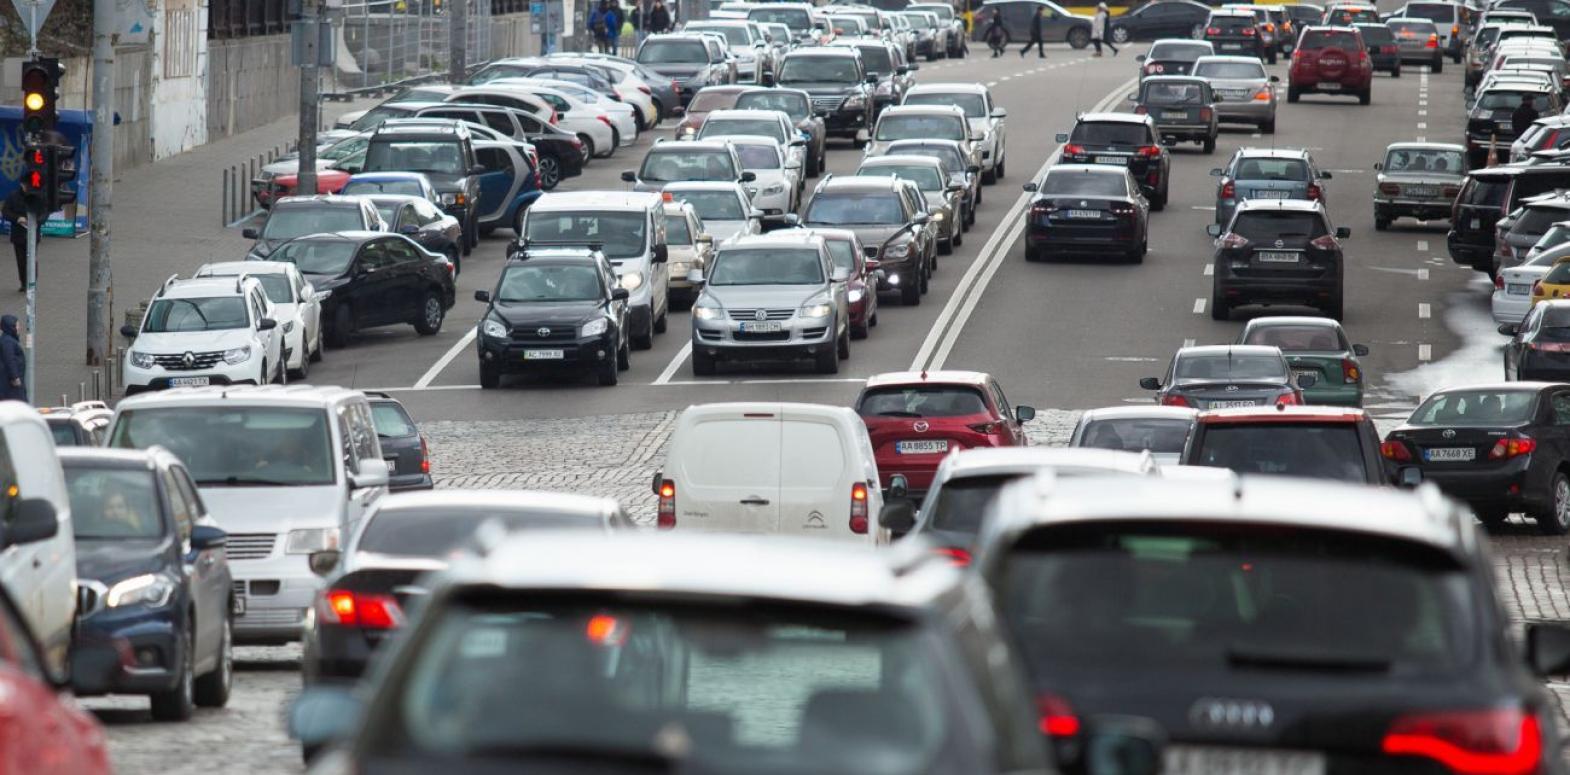 Бензин и ДТ дорожают: сколько стоит топливо на АЗС